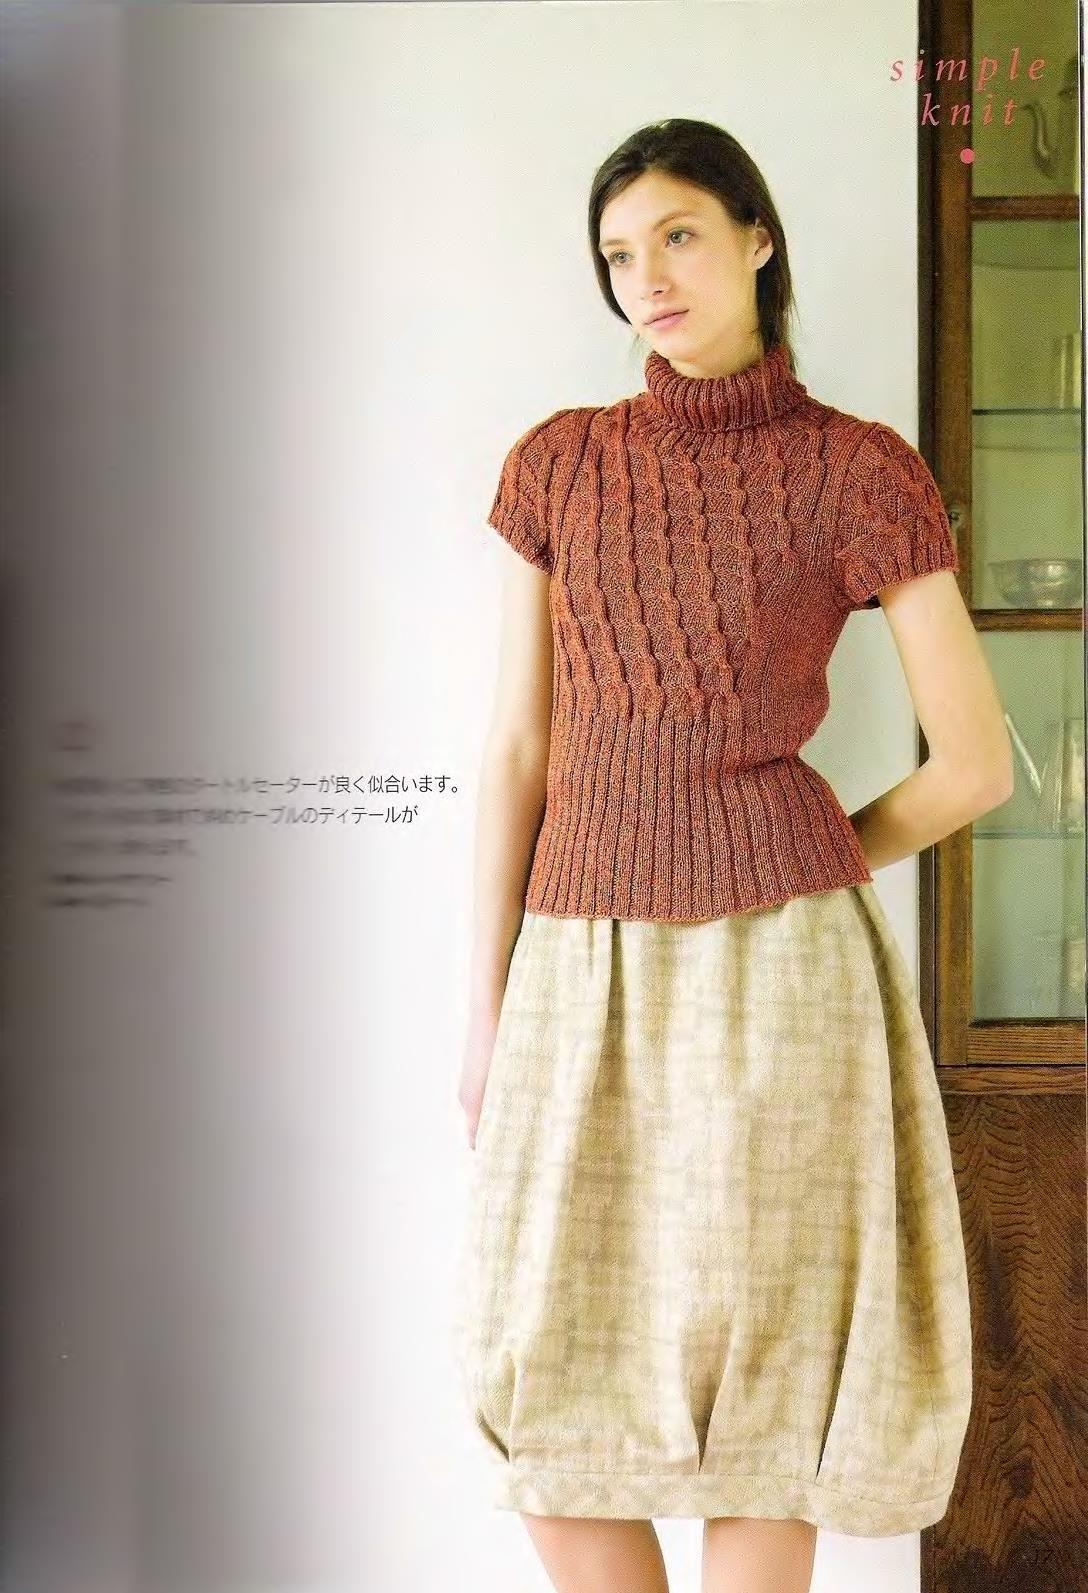 Let's knit series NV4375 2008 M-L sp-kr_17